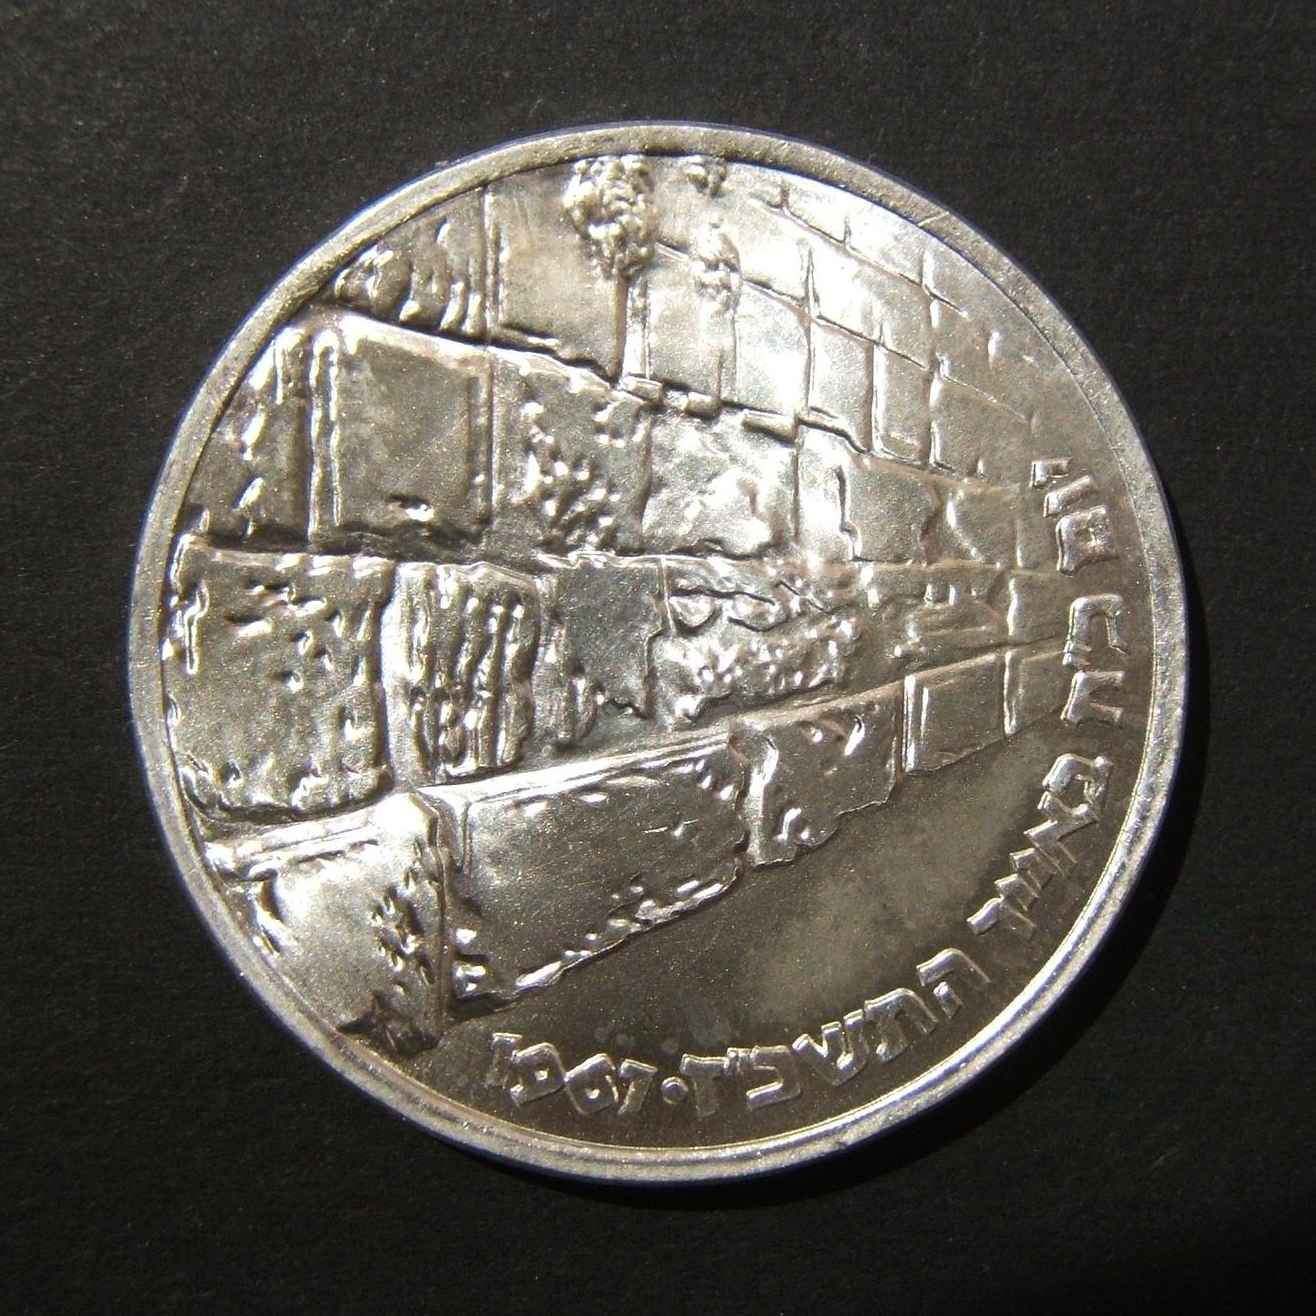 Israel: 10 Lira